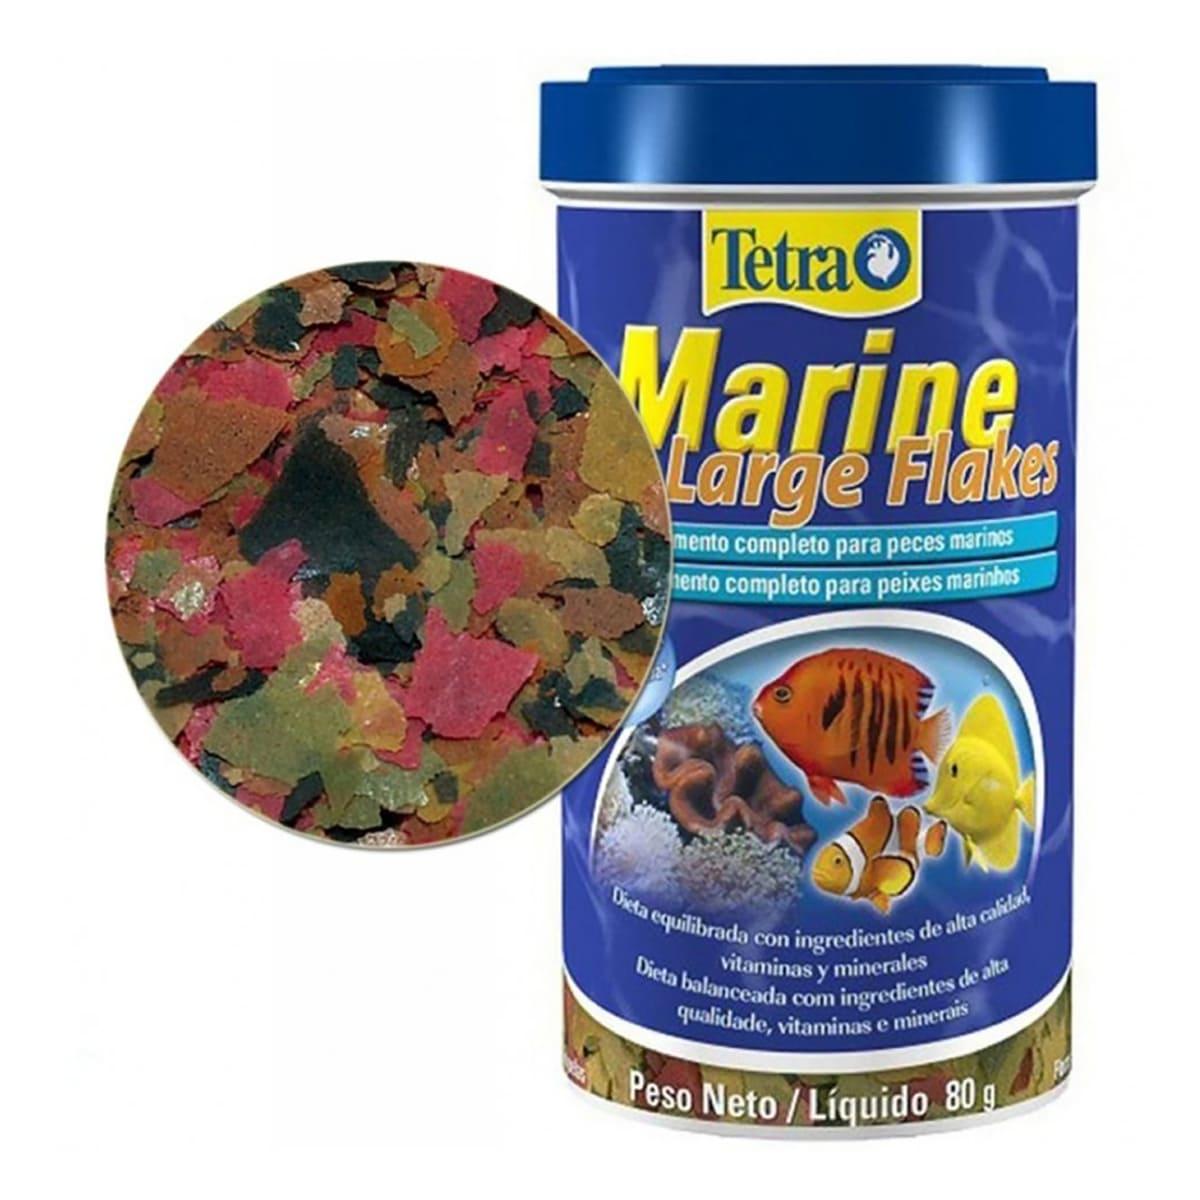 Tetra Marine Large Flakes 80g Alimento para Peixes Marinhos